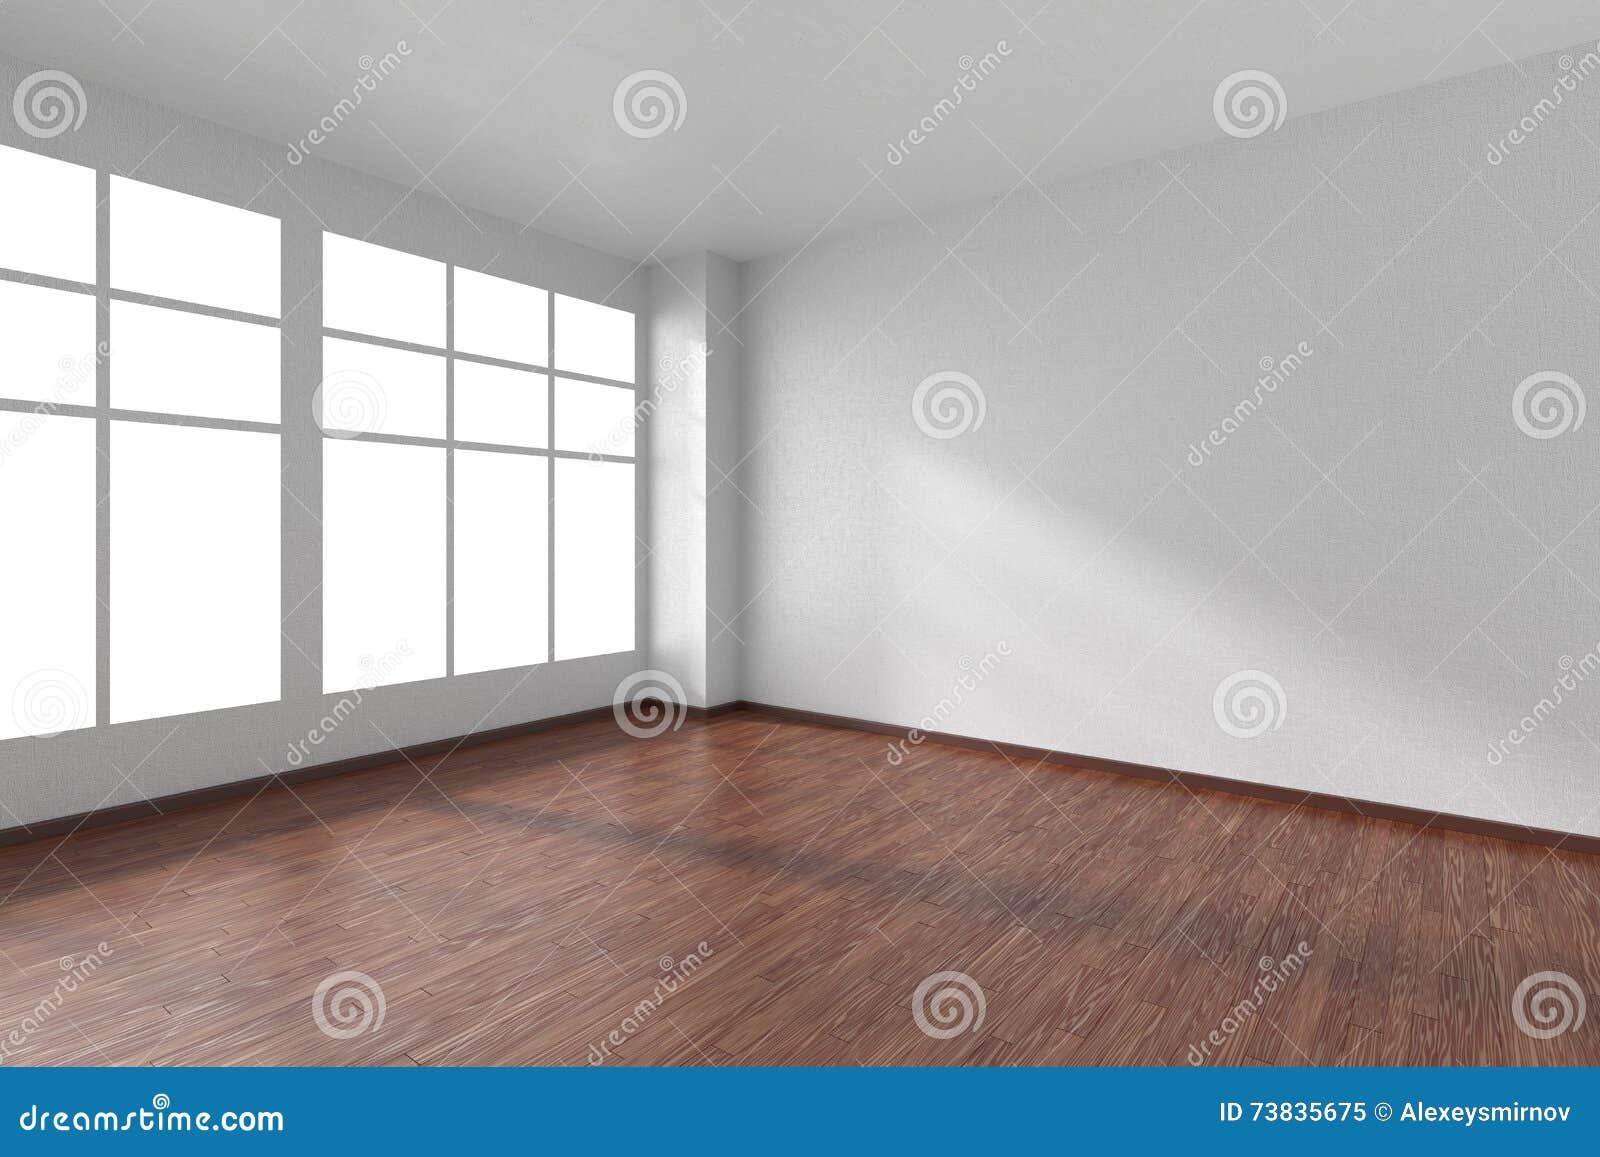 Dark empty room with window - Empty Room With Dark Wooden Parquet Floor Textured White Walls Royalty Free Stock Photo